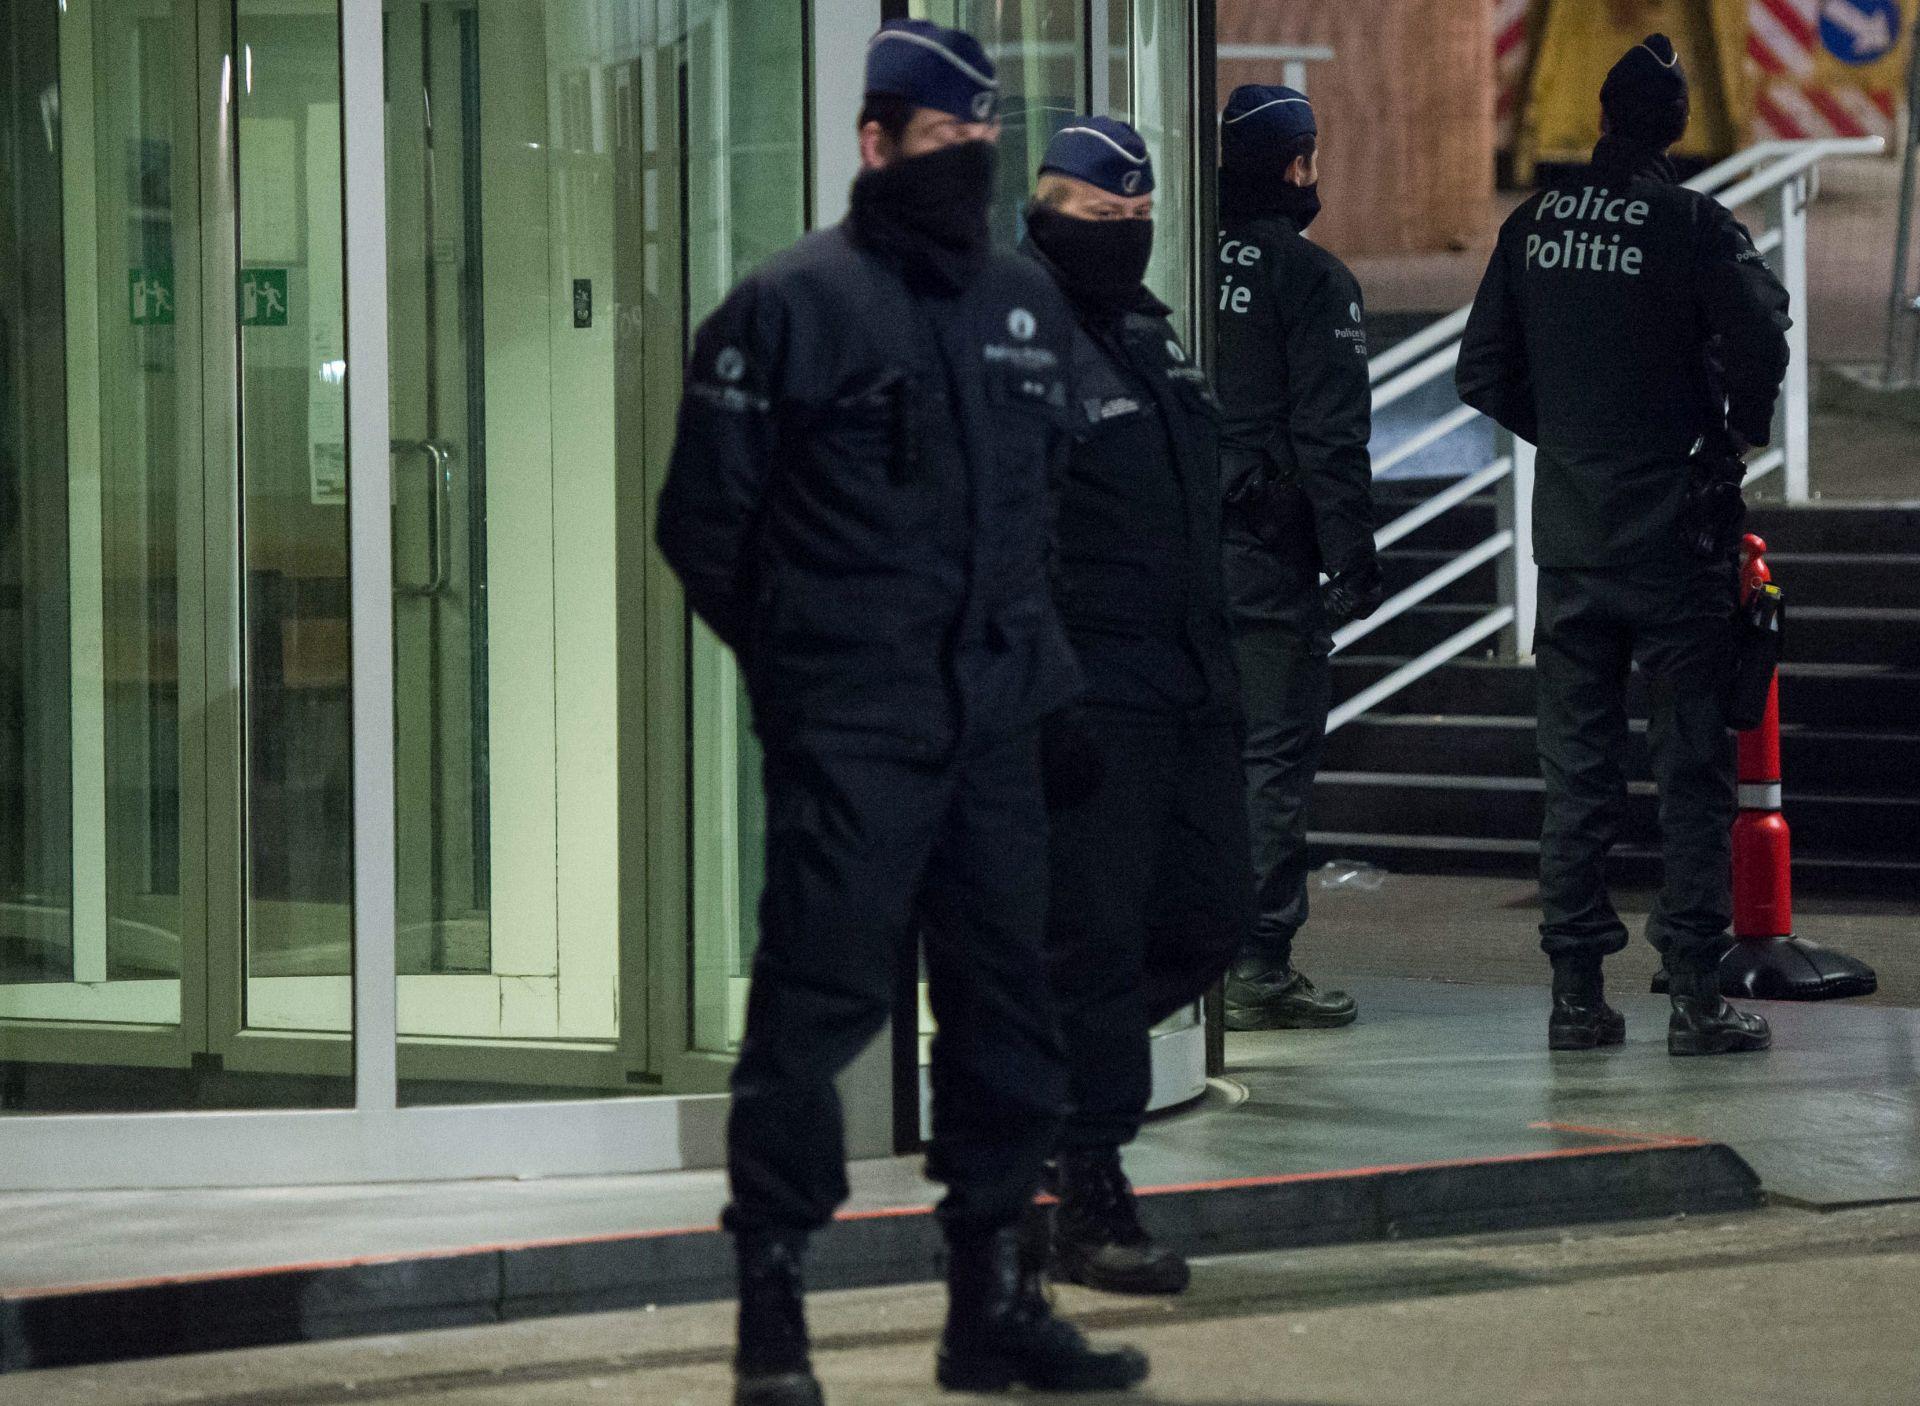 POLICIJSKA AKCIJA U BRUXELLESU Osumnjičenik ranjen i uhićen